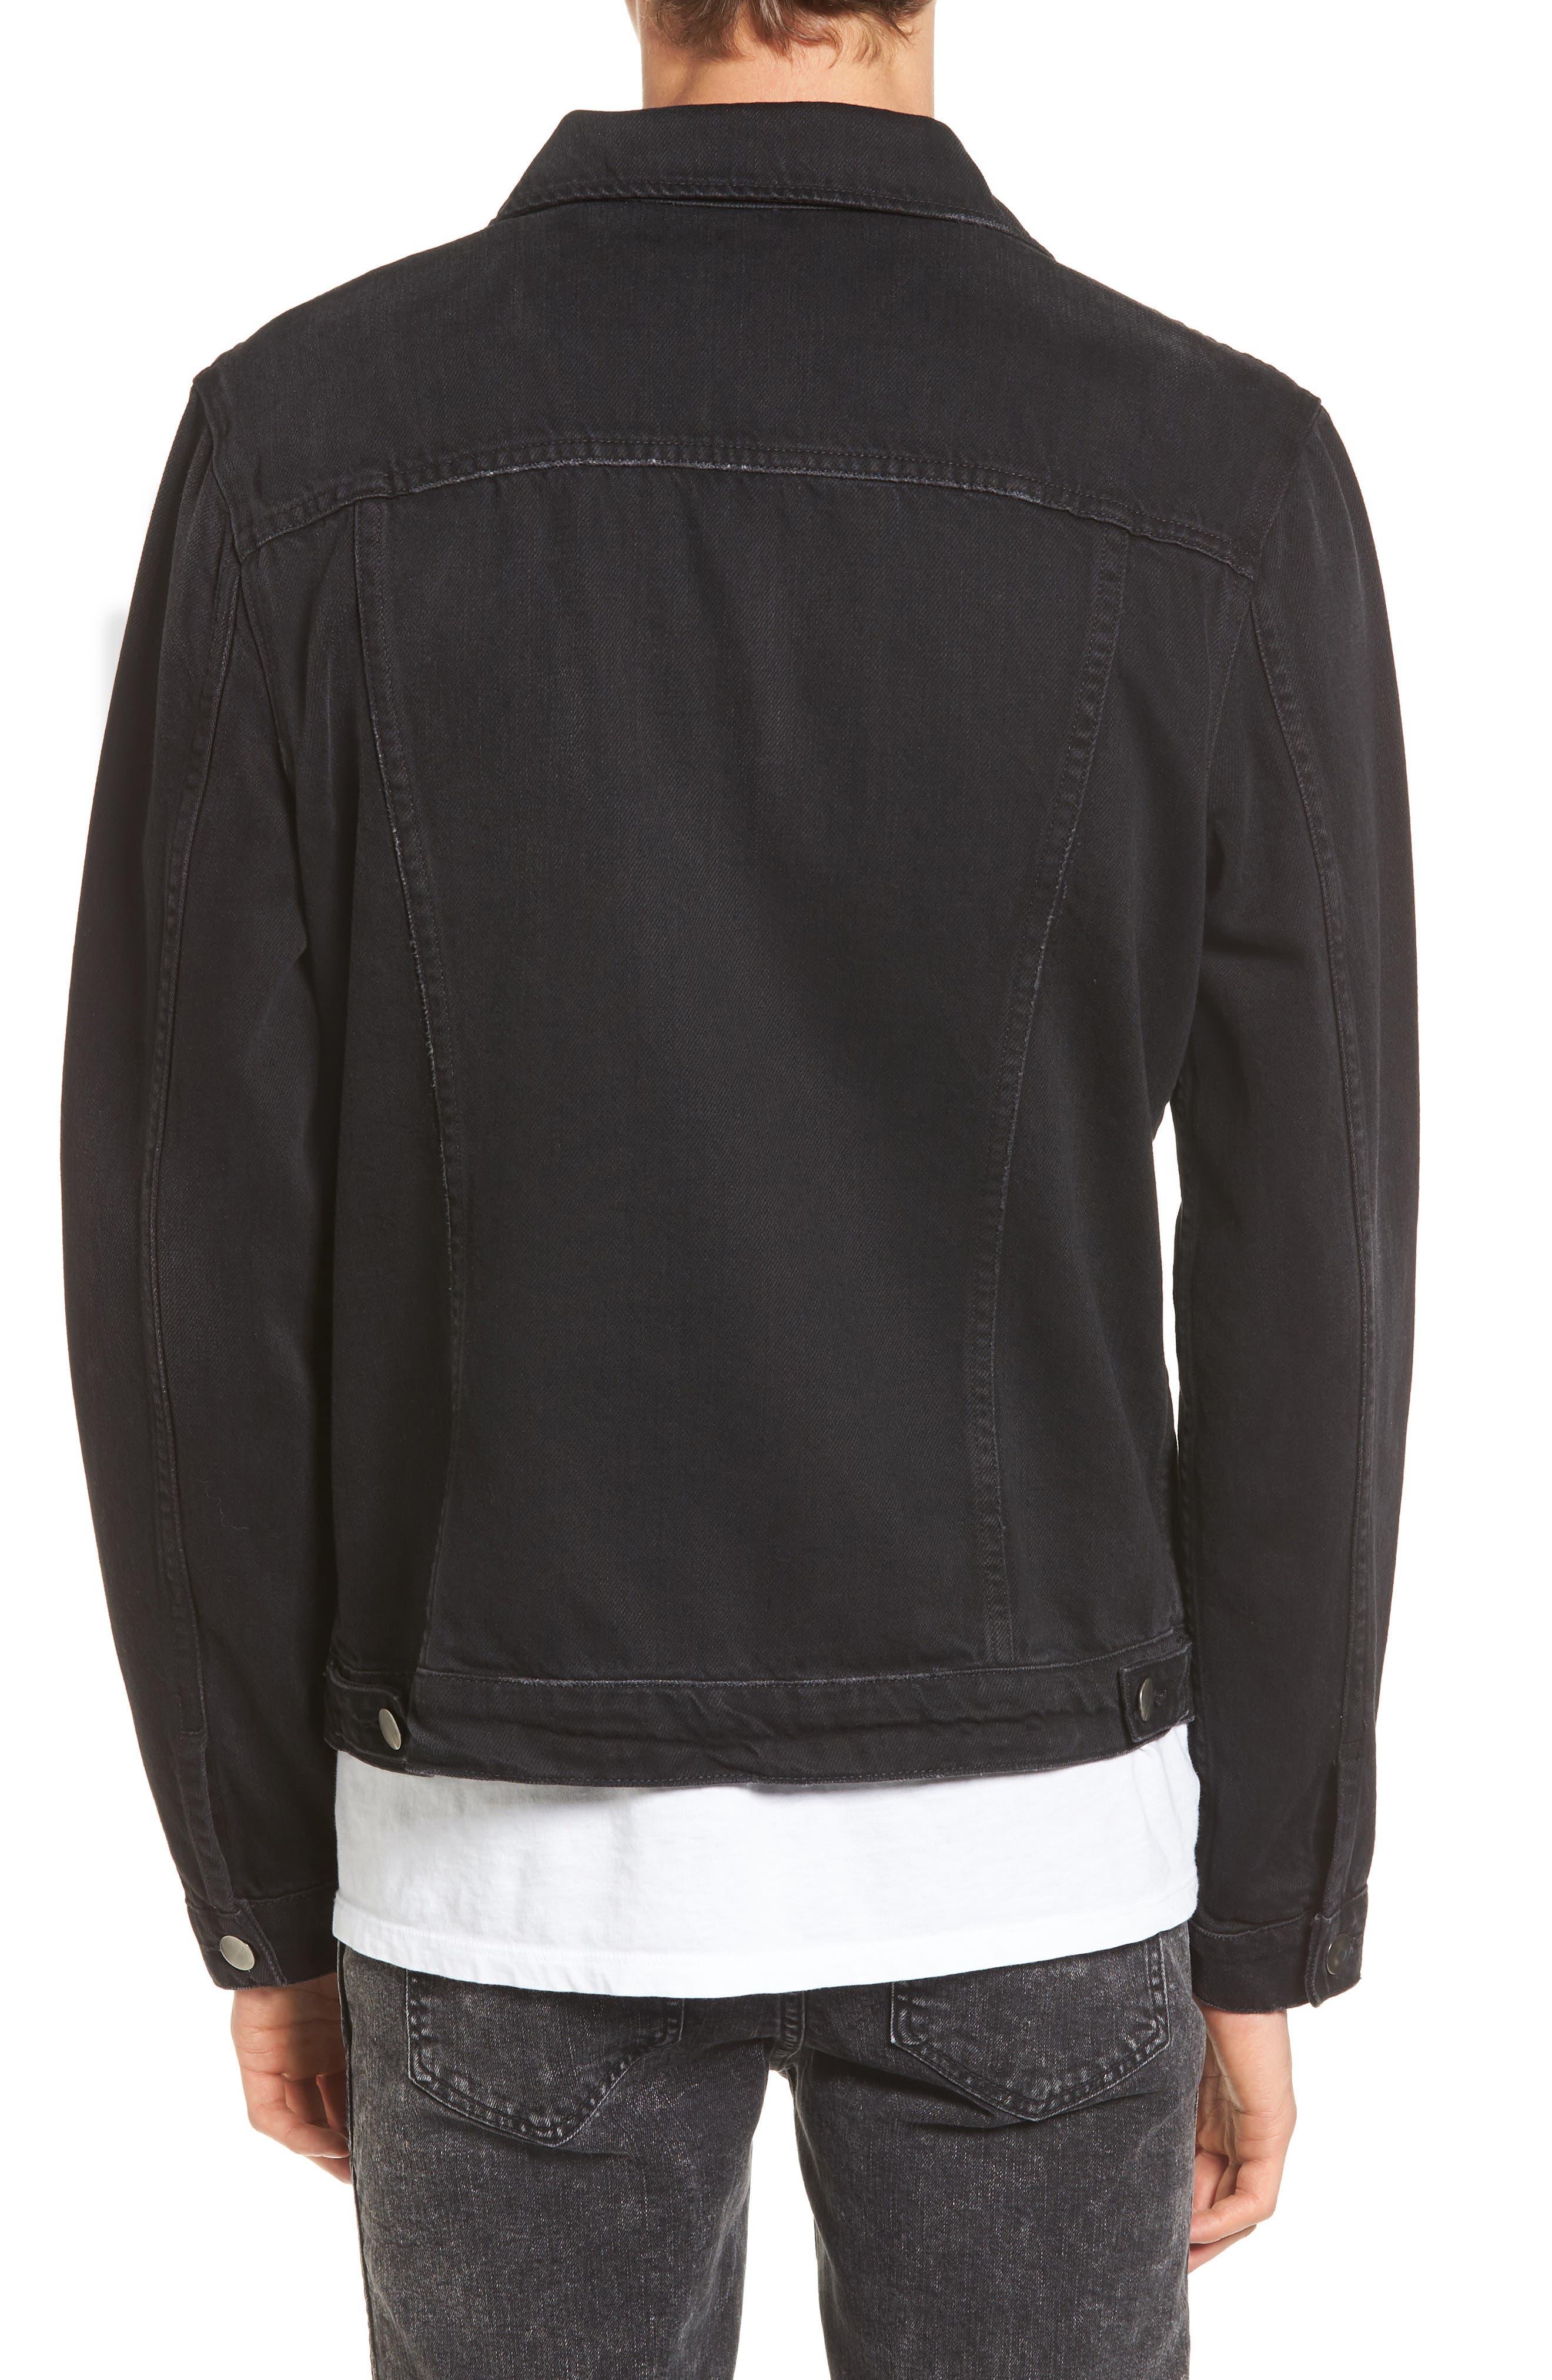 L'Homme Denim Jacket,                             Alternate thumbnail 2, color,                             001